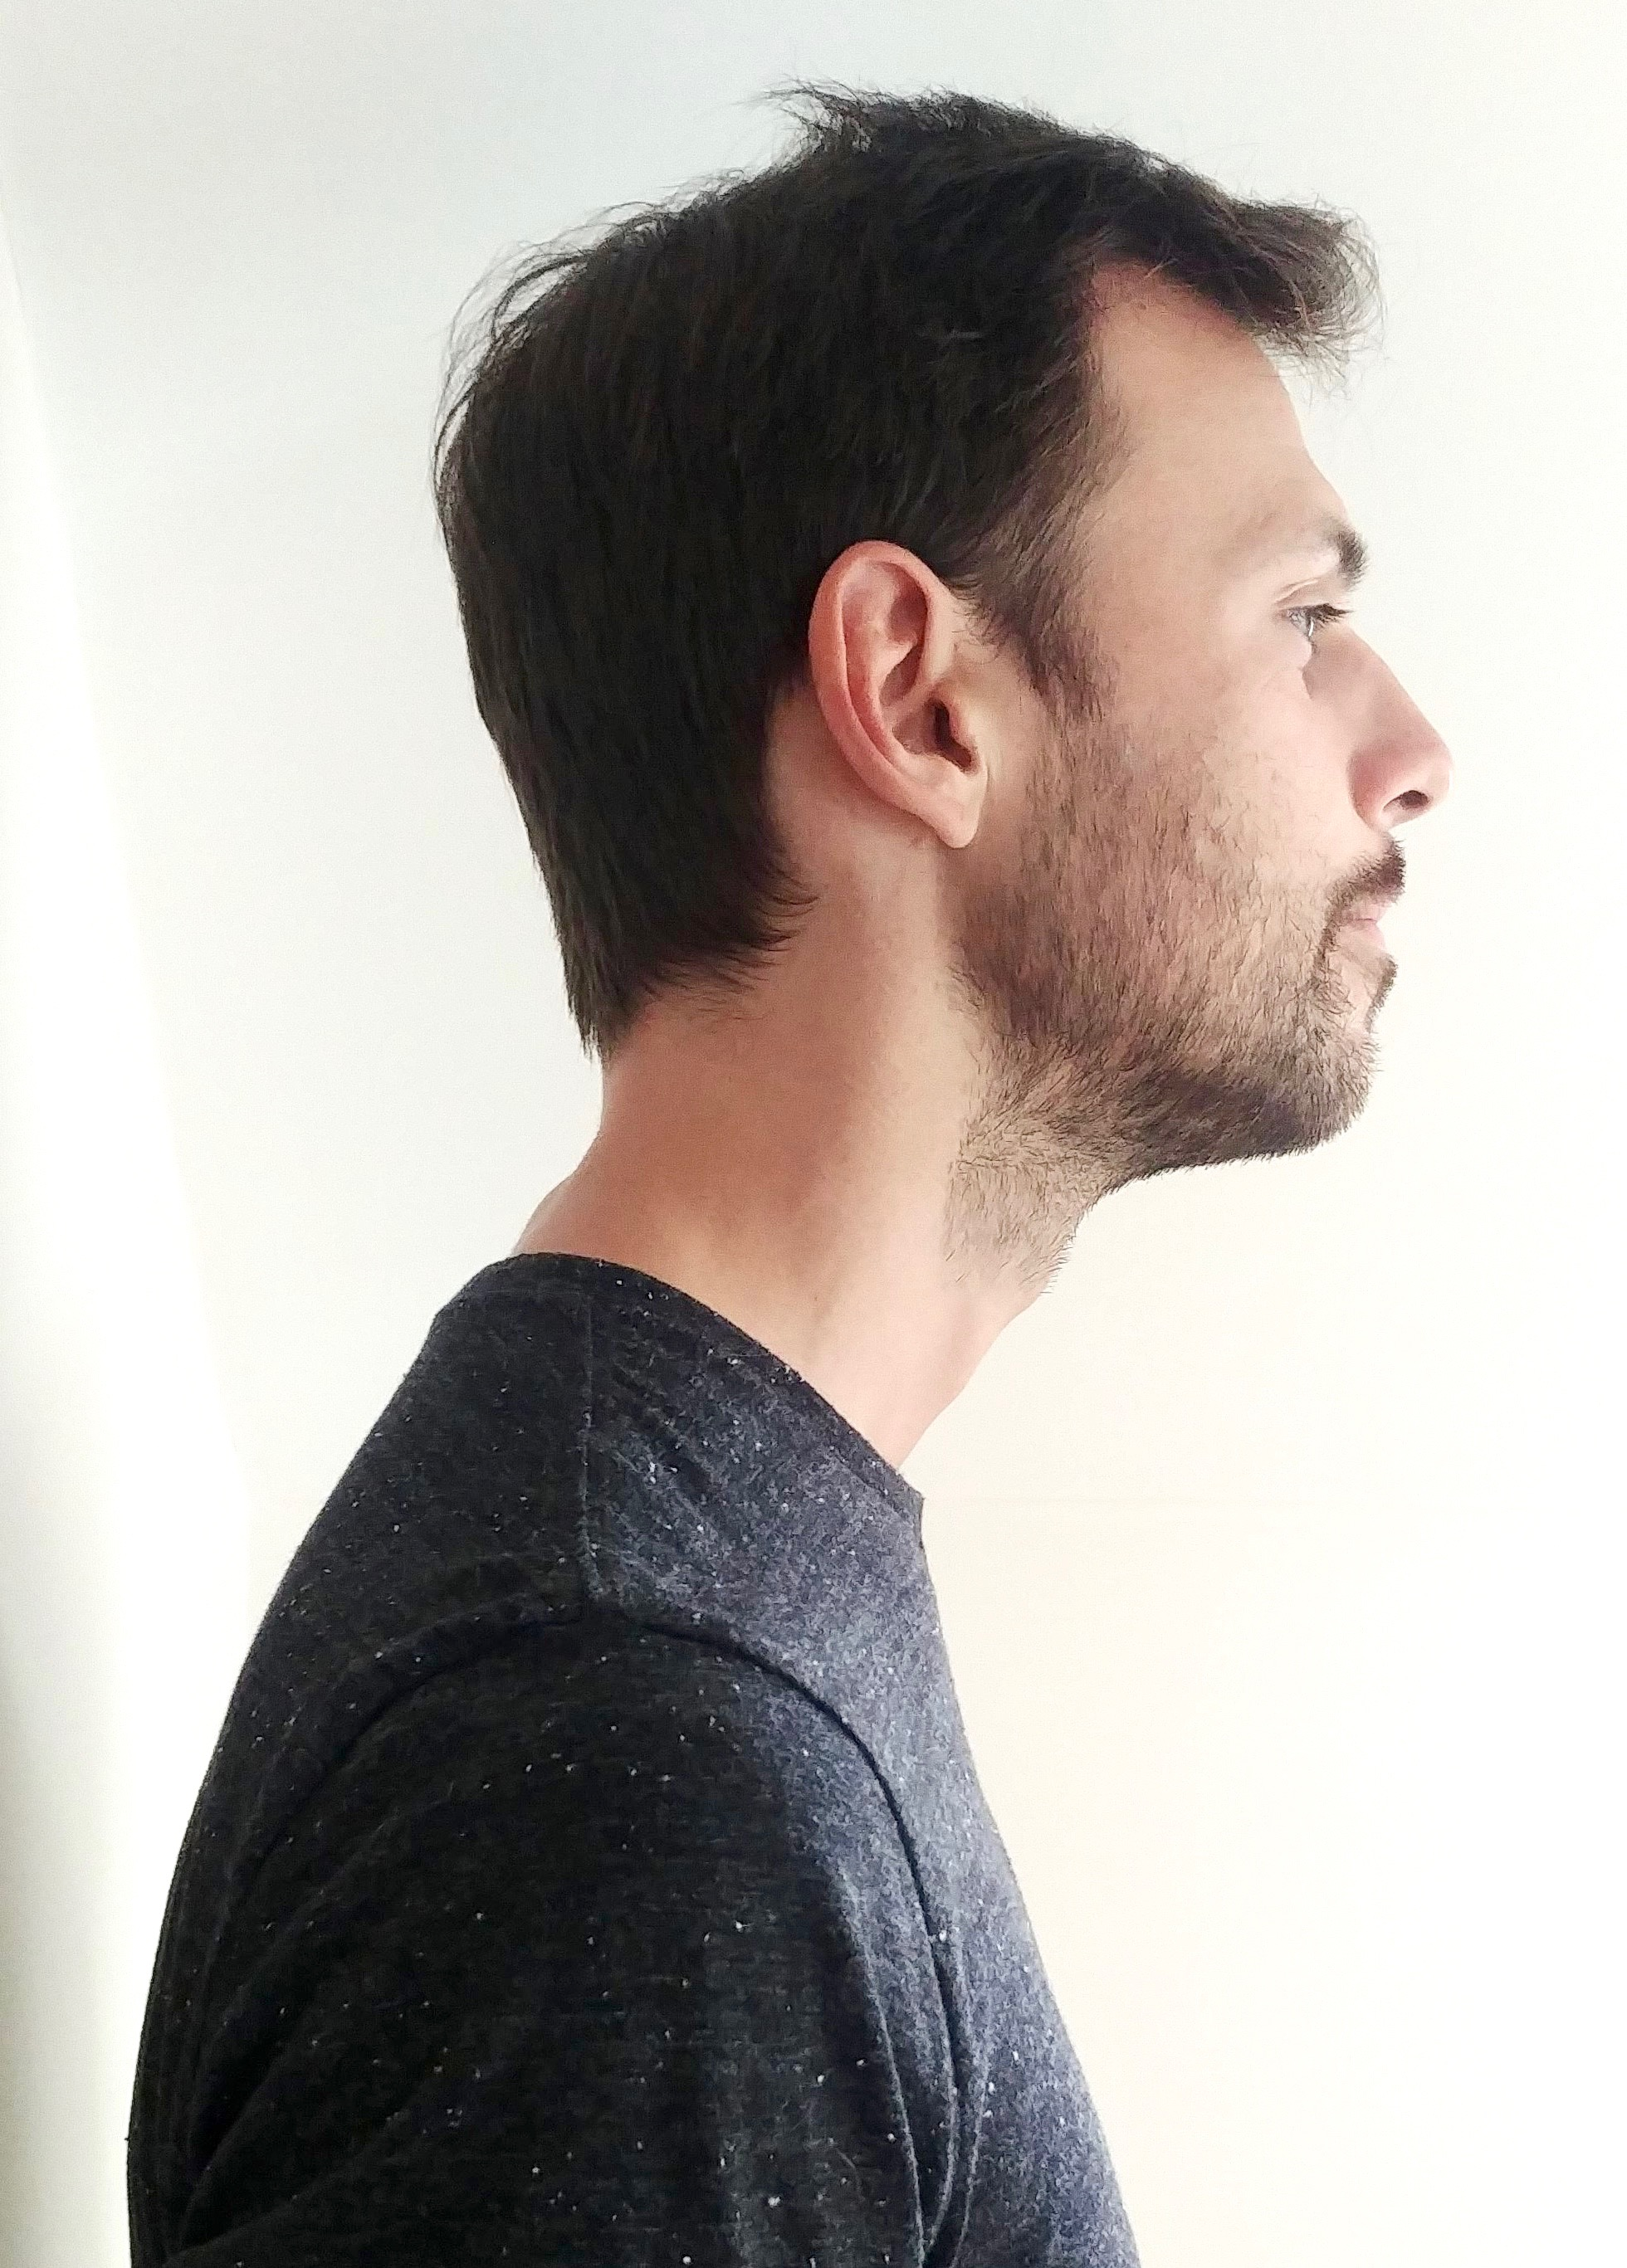 Better posture, chin forward image